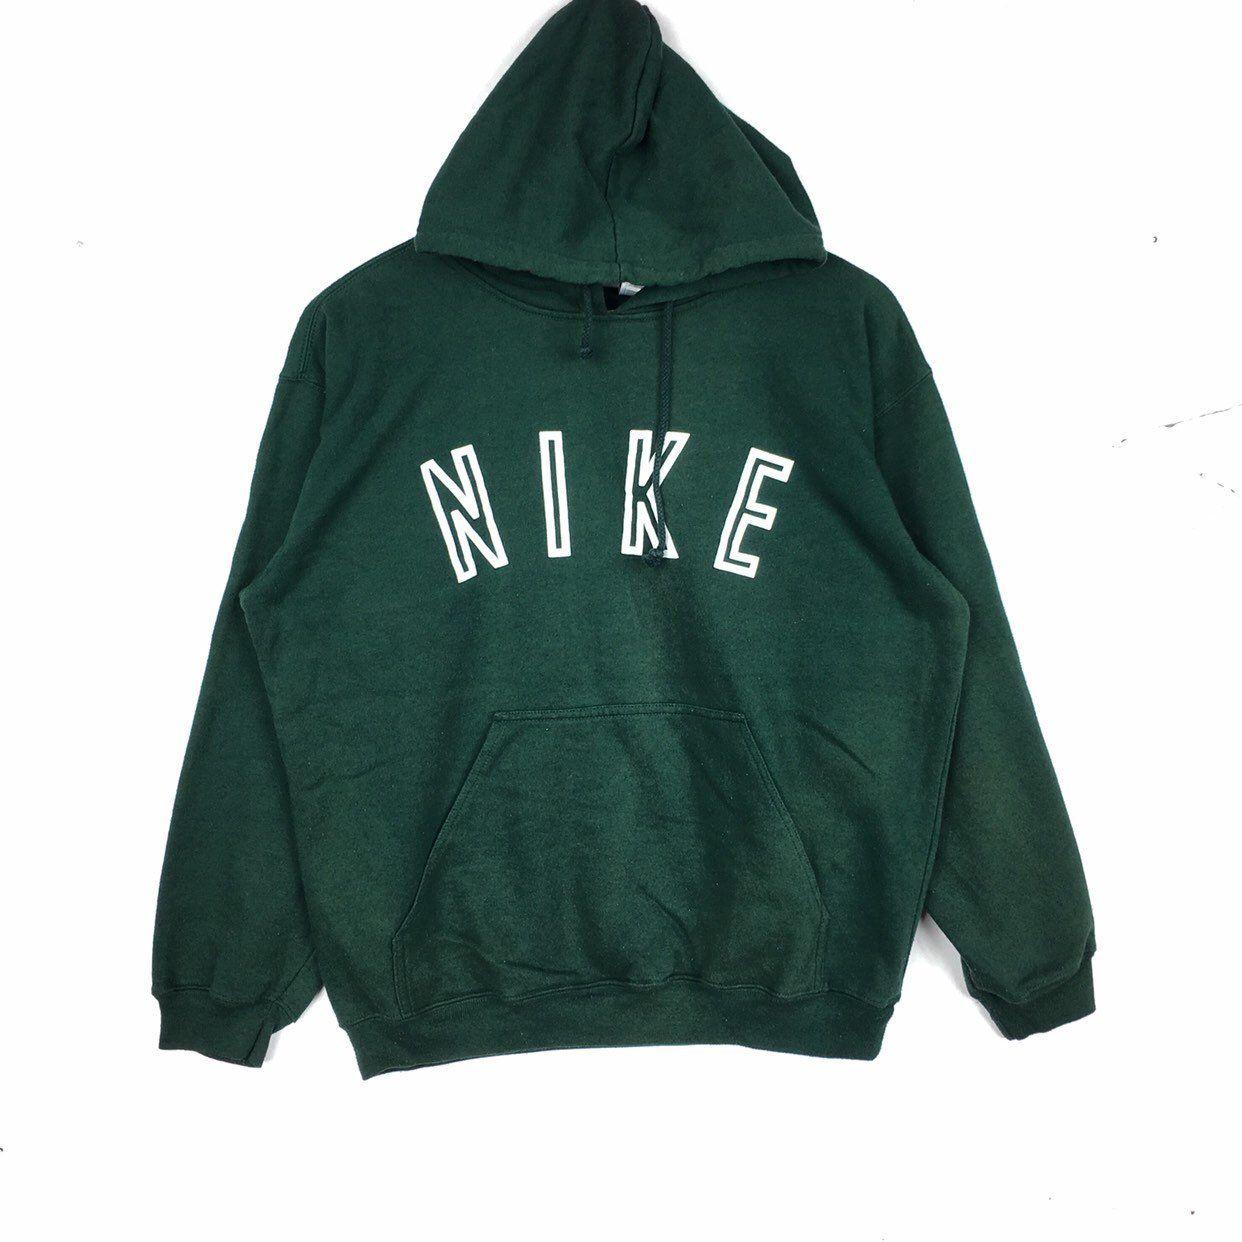 Vintage 90s Nike Big Logo Hoodie Anarok Colour Block Xl Size Etsy Vintage Nike Sweatshirt Sweatshirts Vintage Hoodies